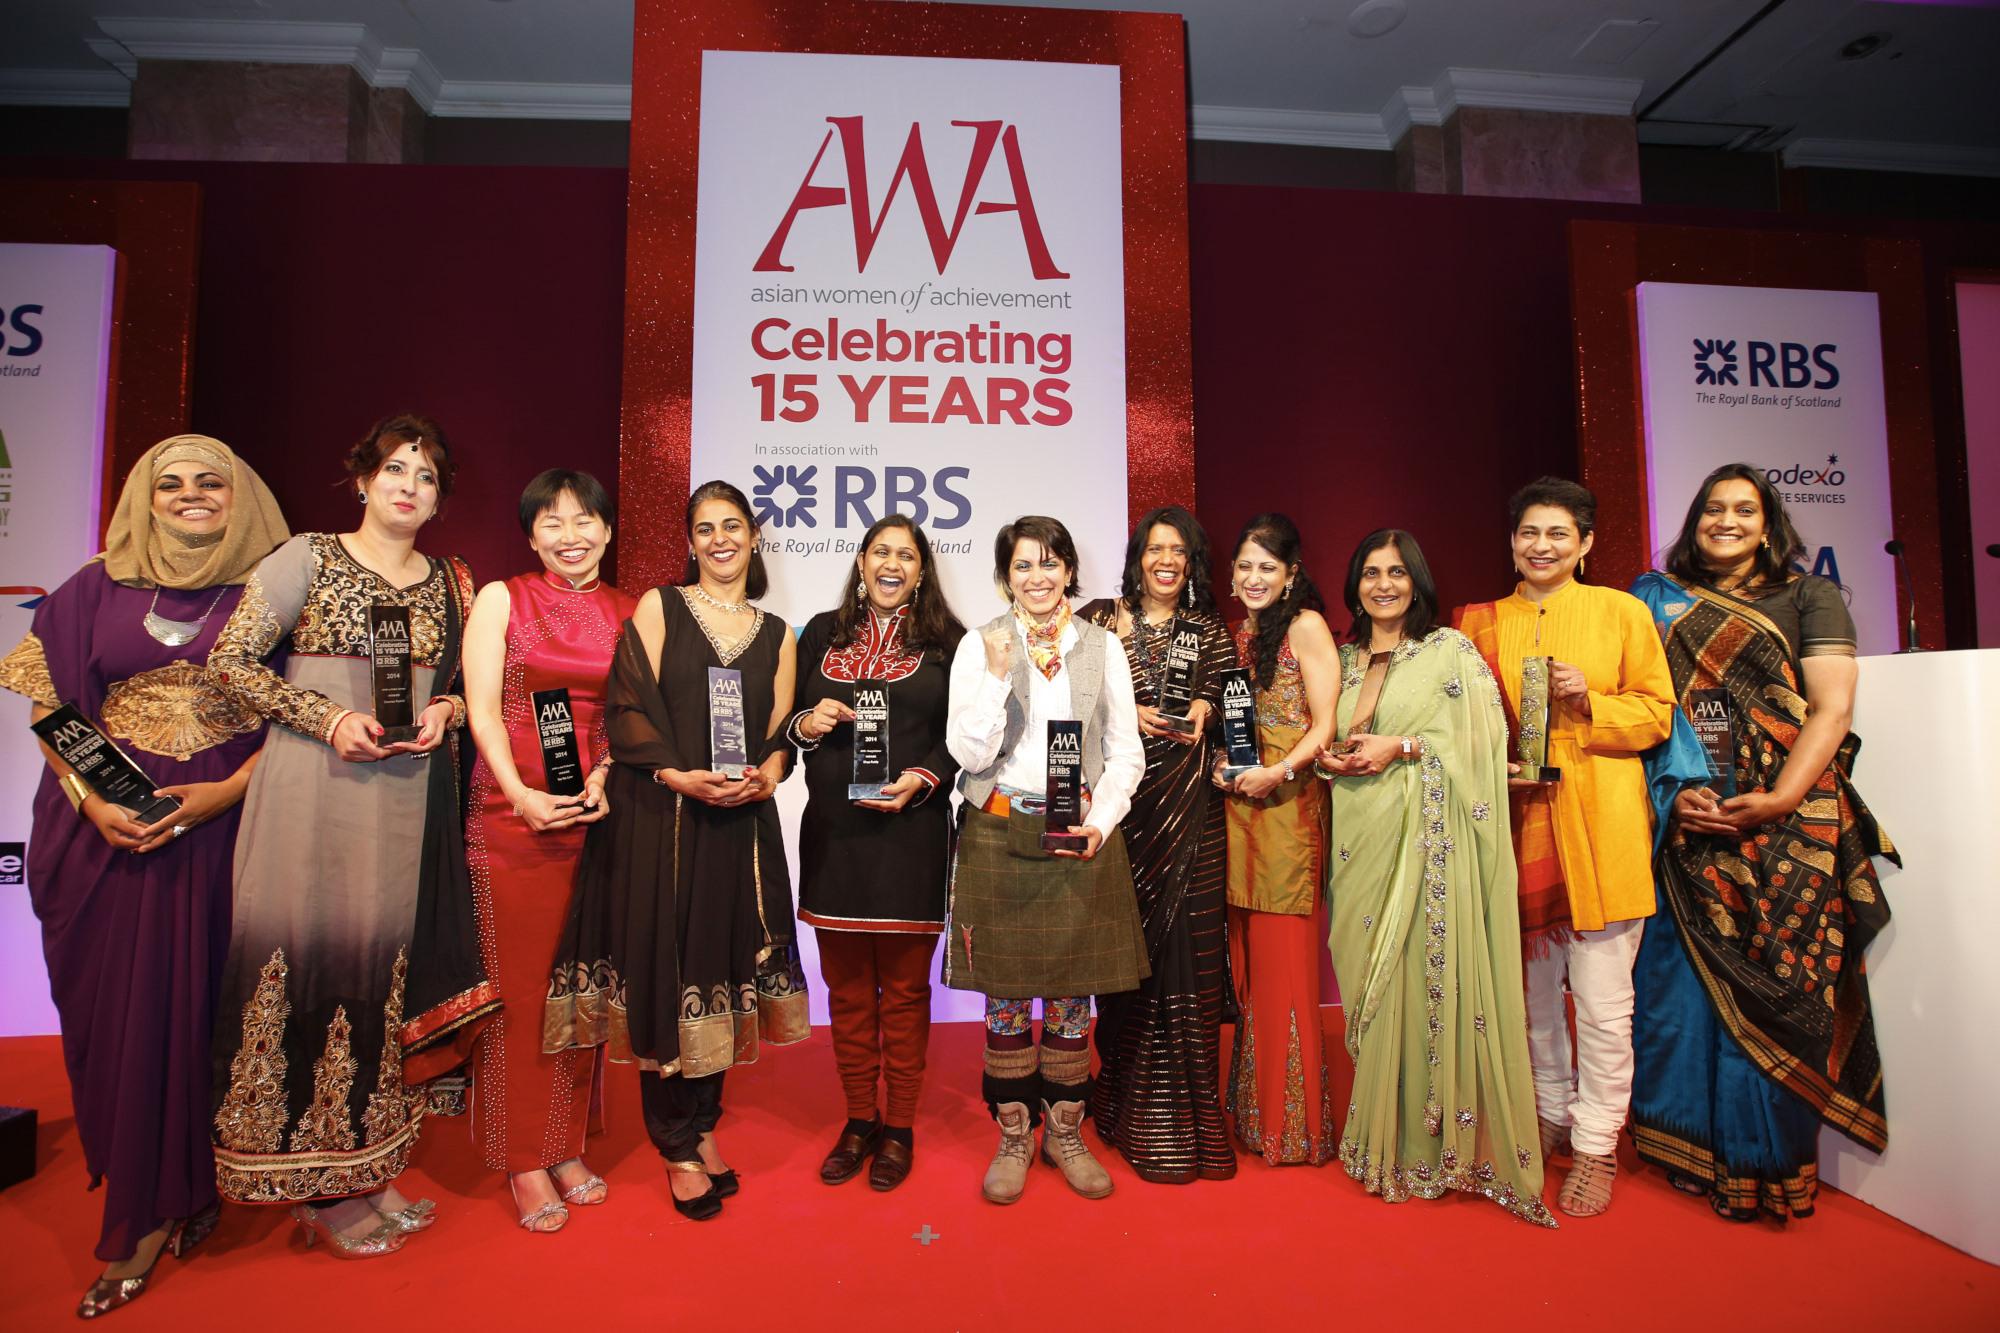 AWA 2014: The winners